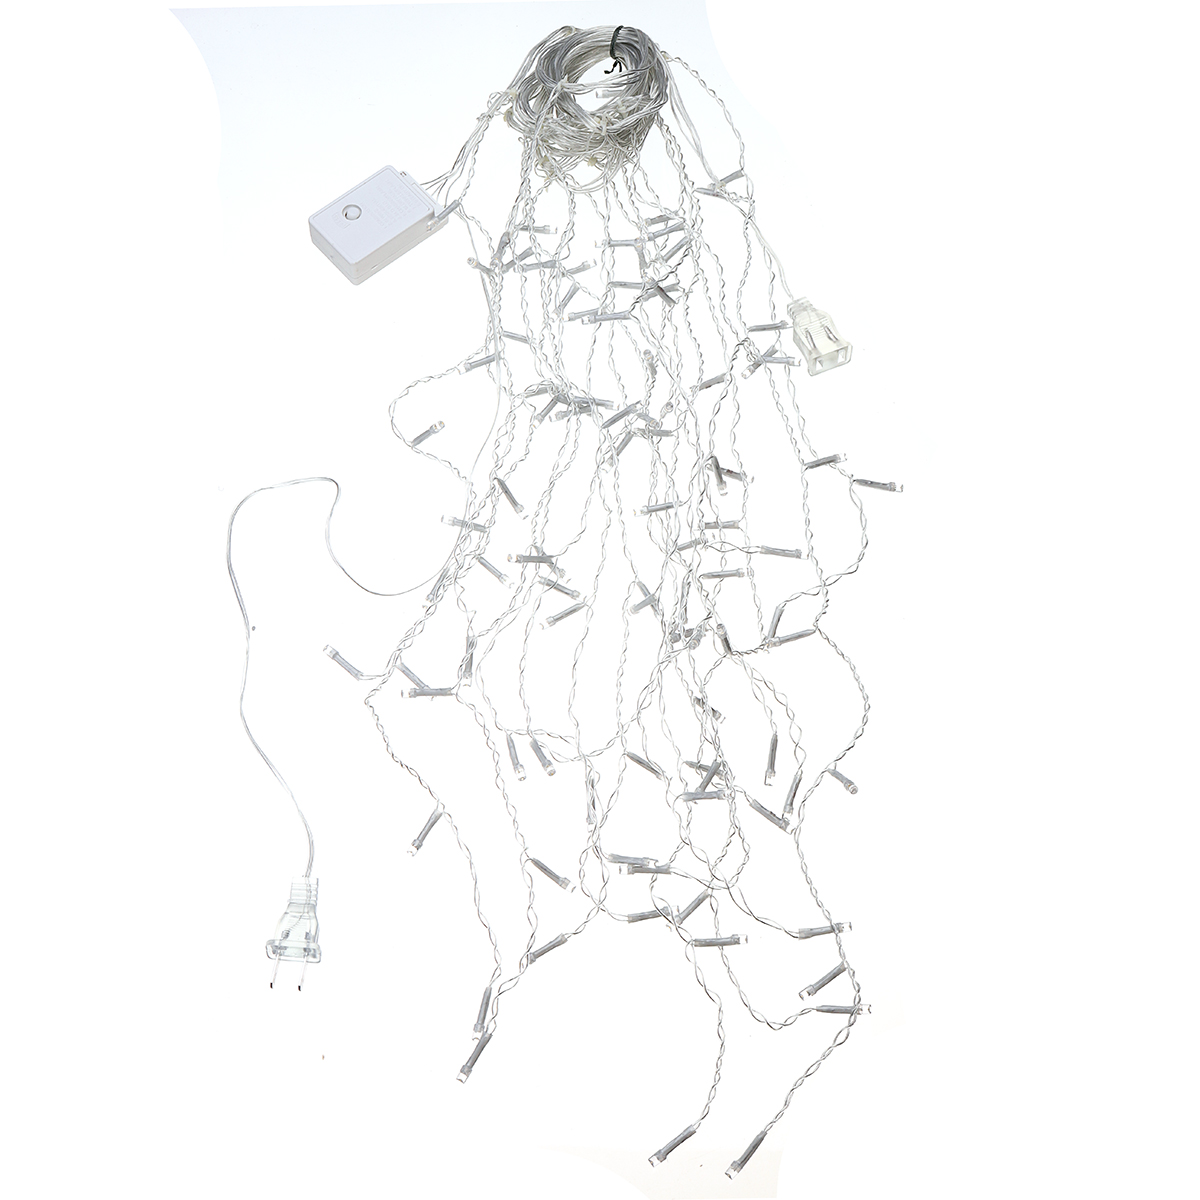 Aliexpress Buy 2m 4m Led Curtain Light String